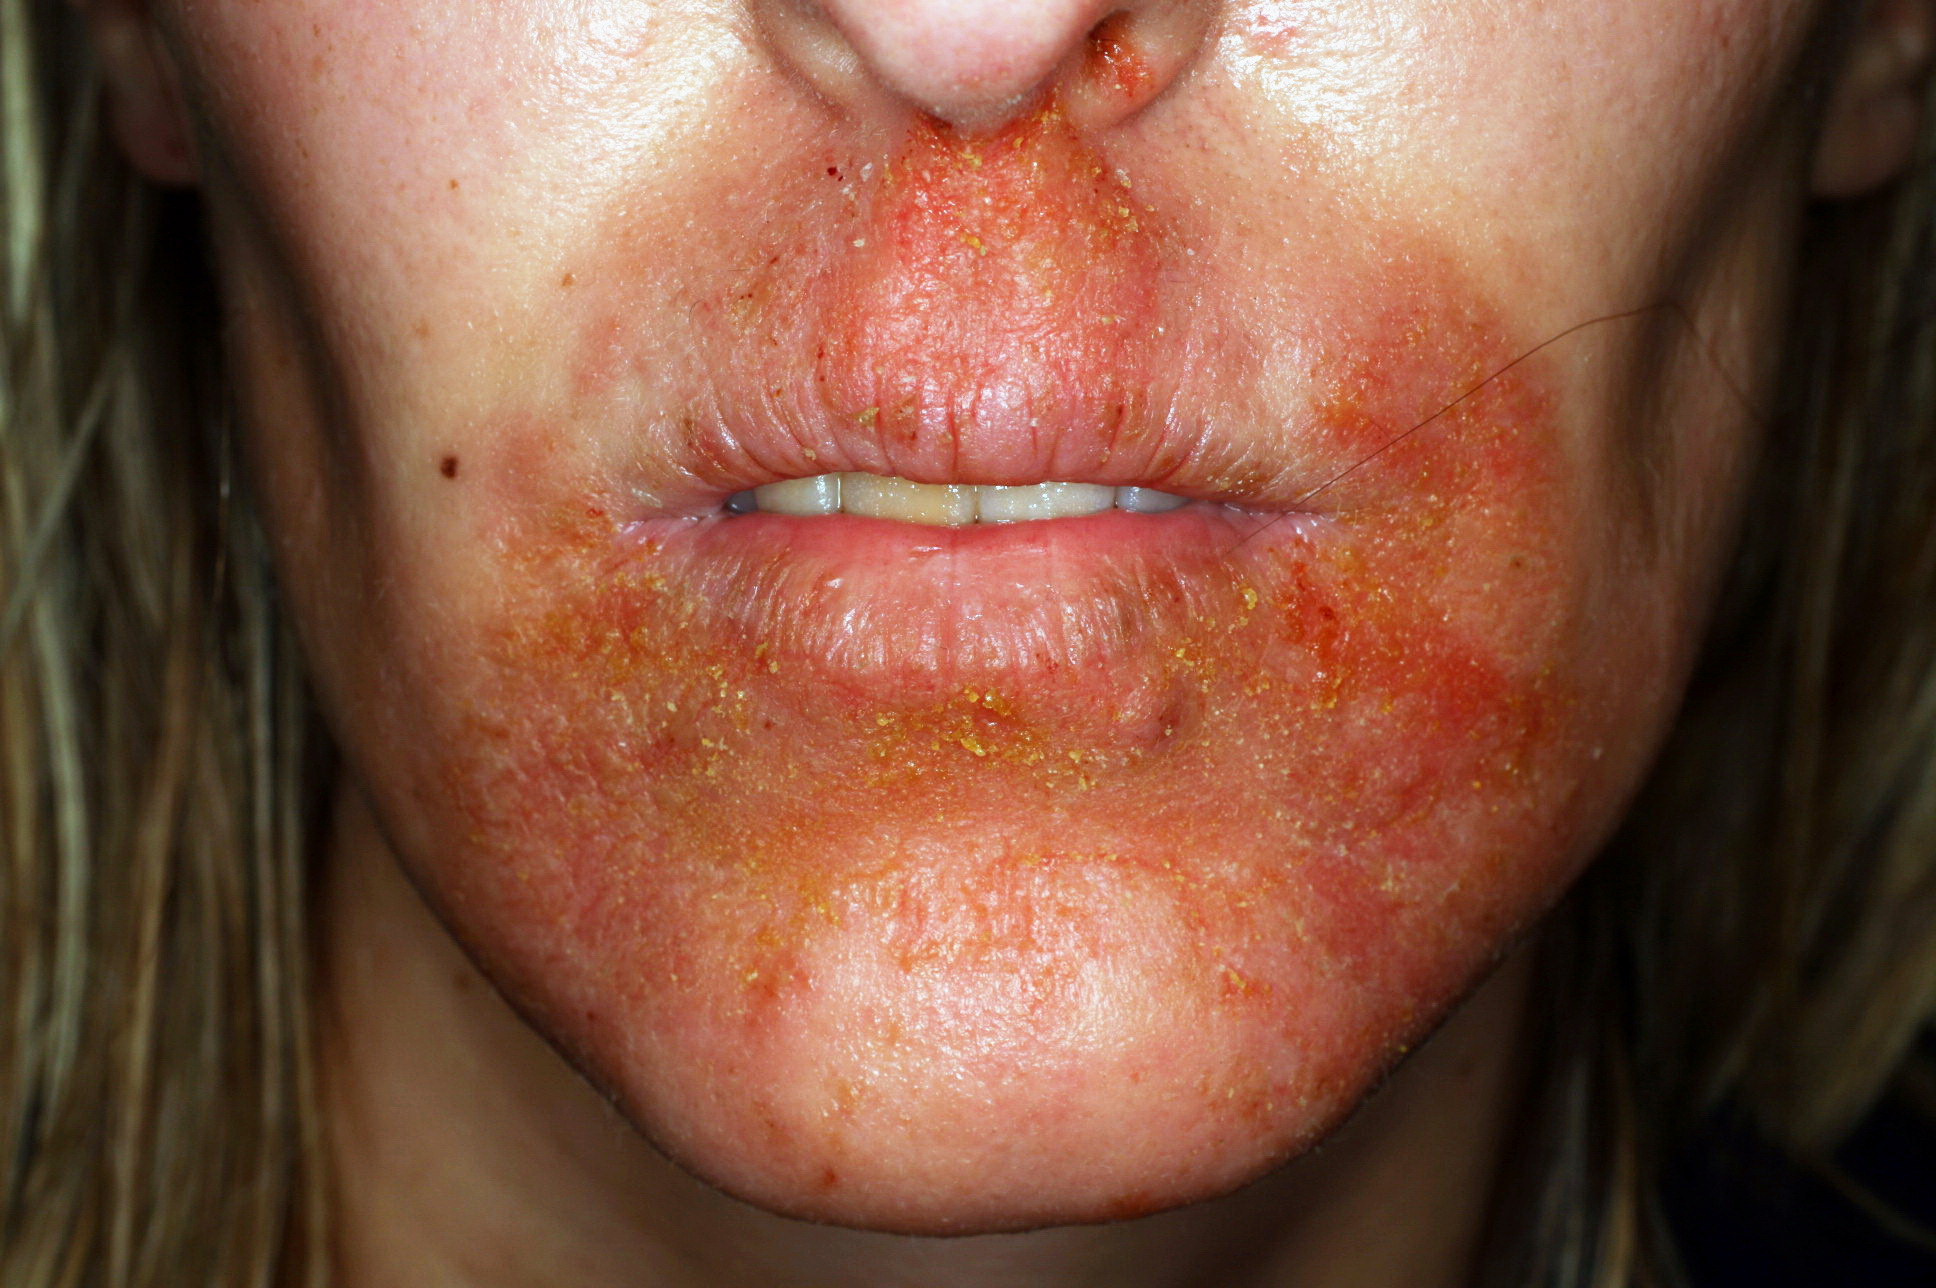 dermatite da cortisone